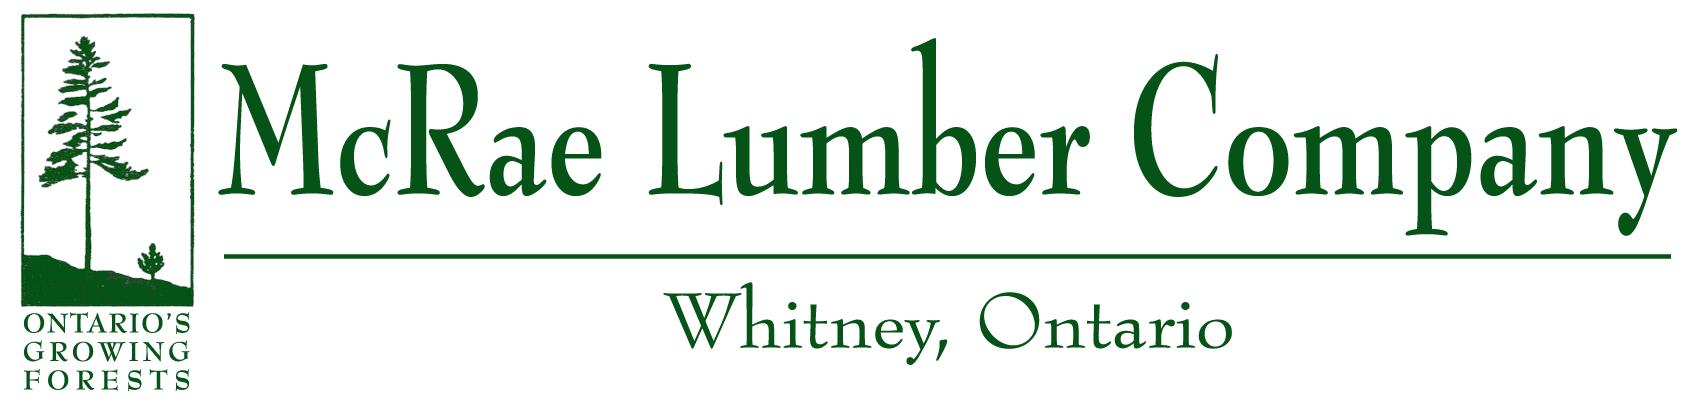 McRae Lumber Company